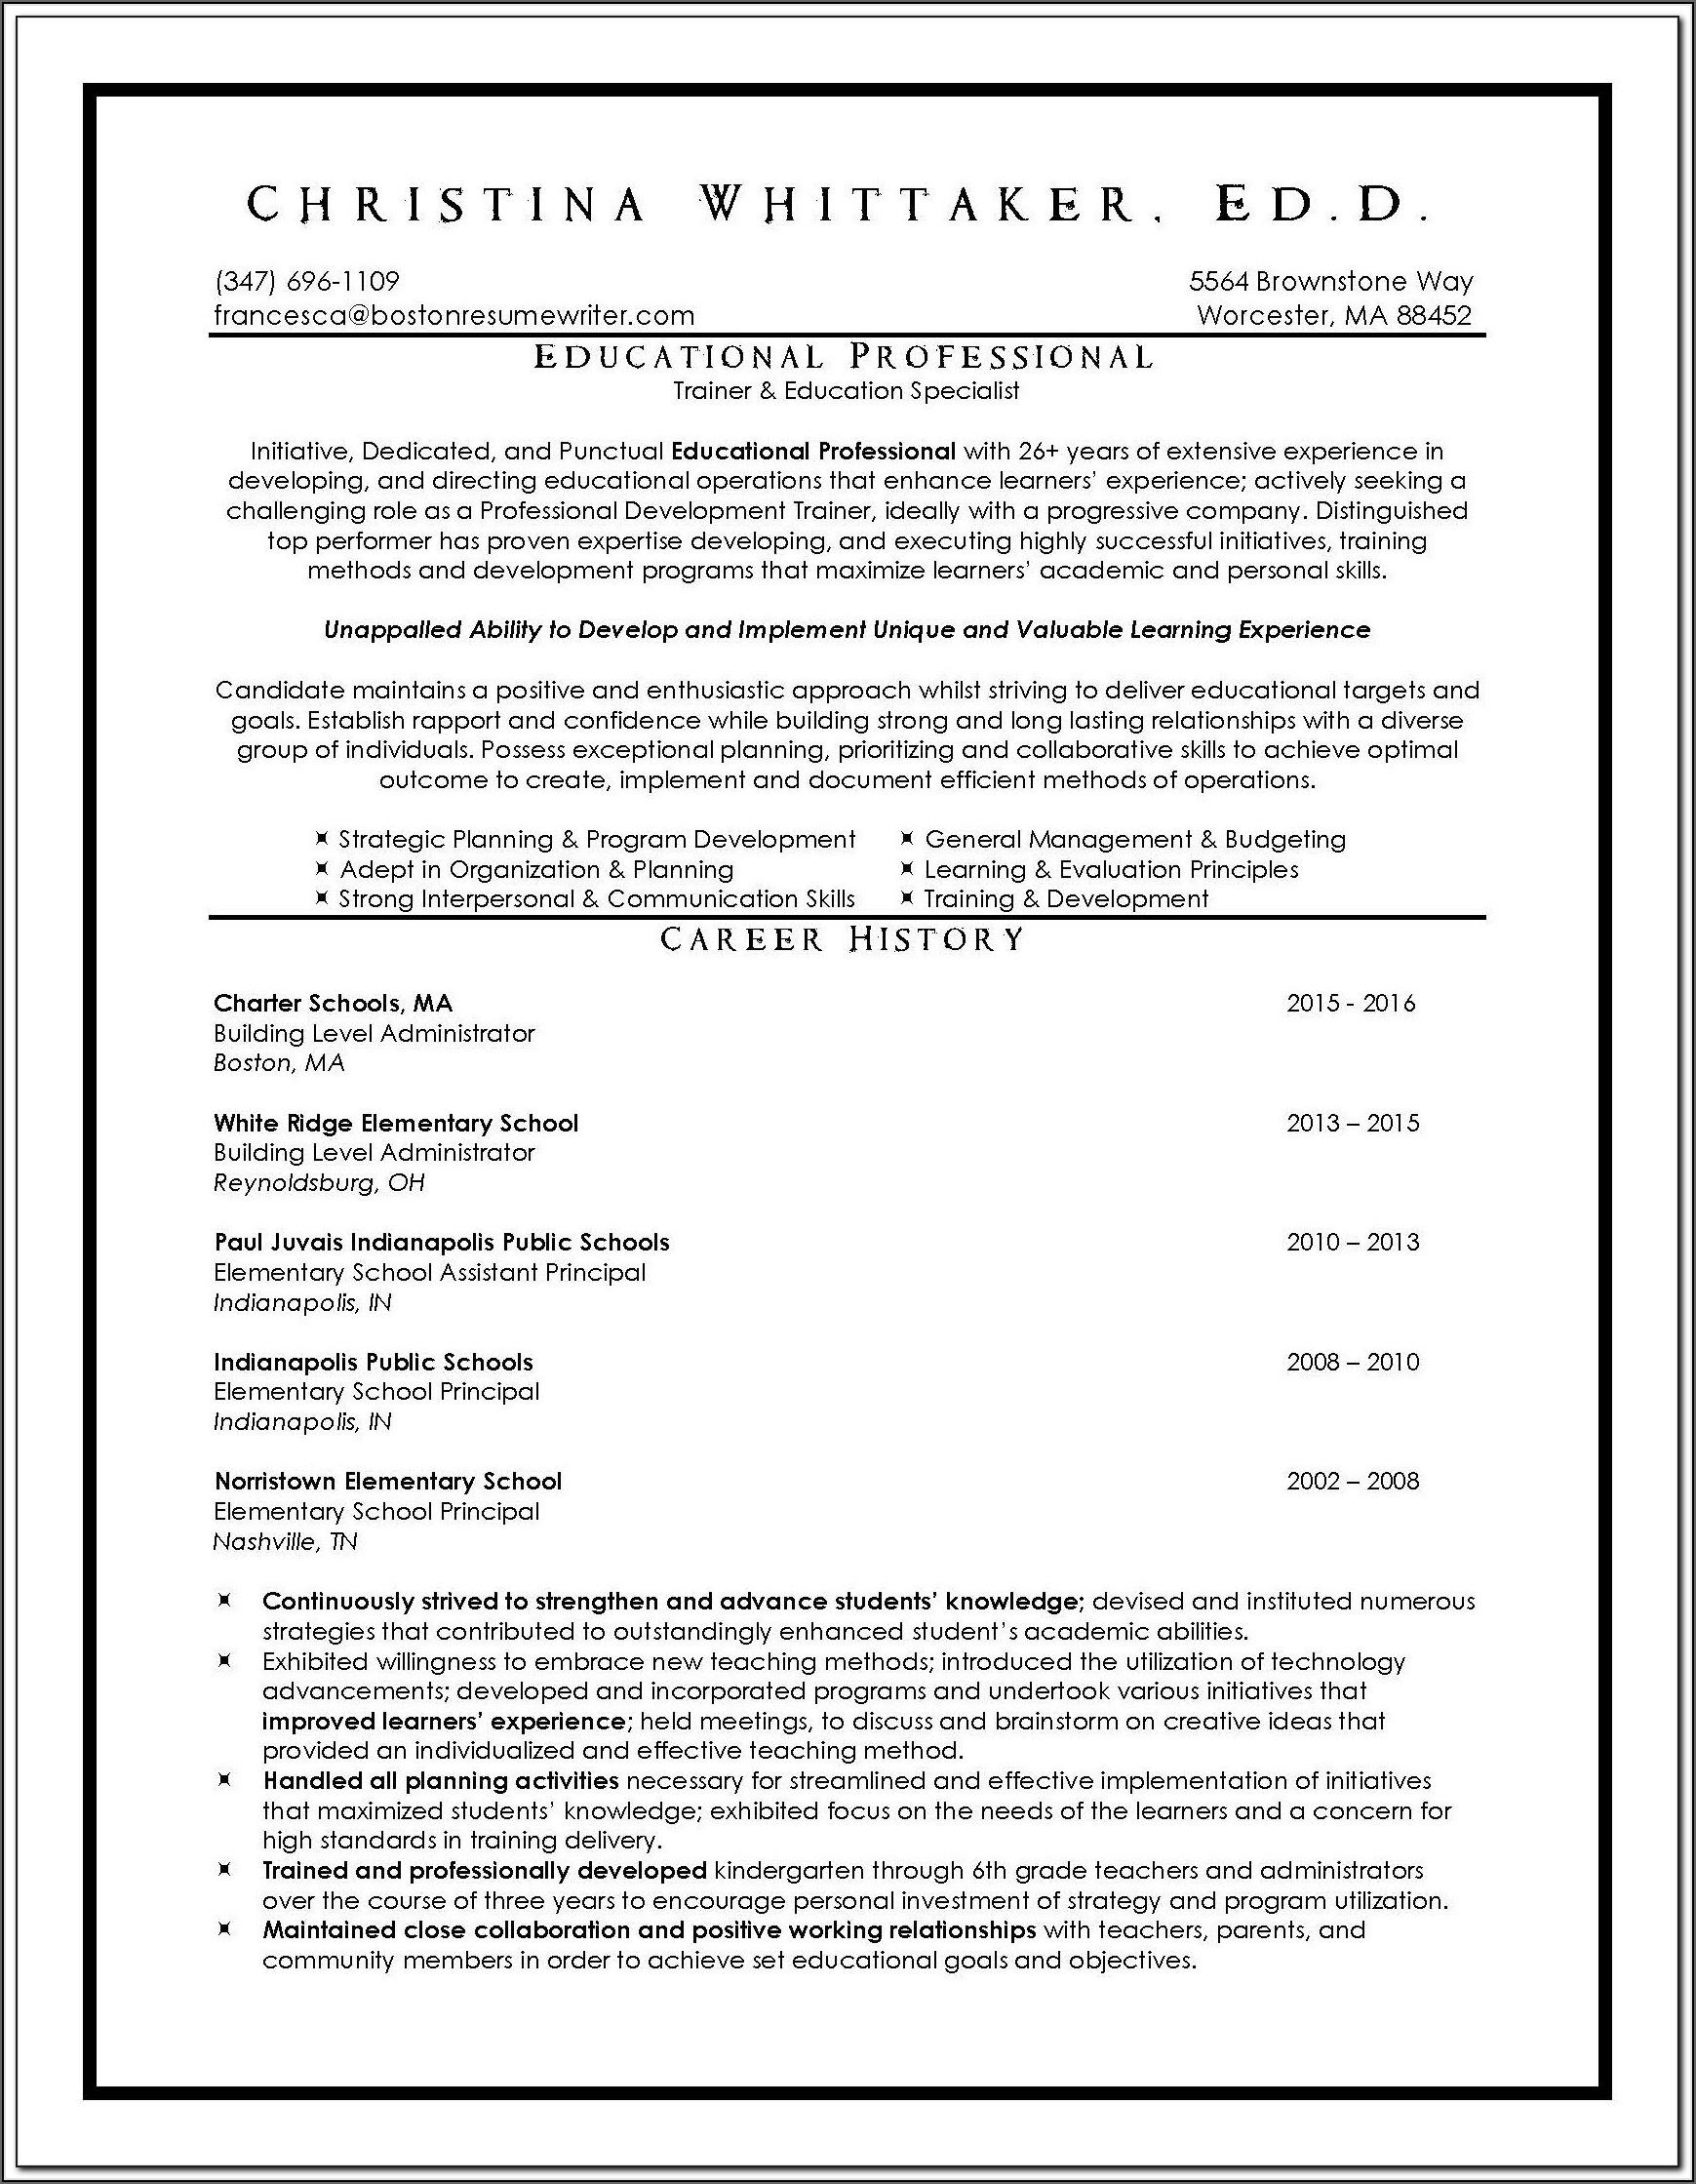 Resume Writing Services (boston Ma Area)